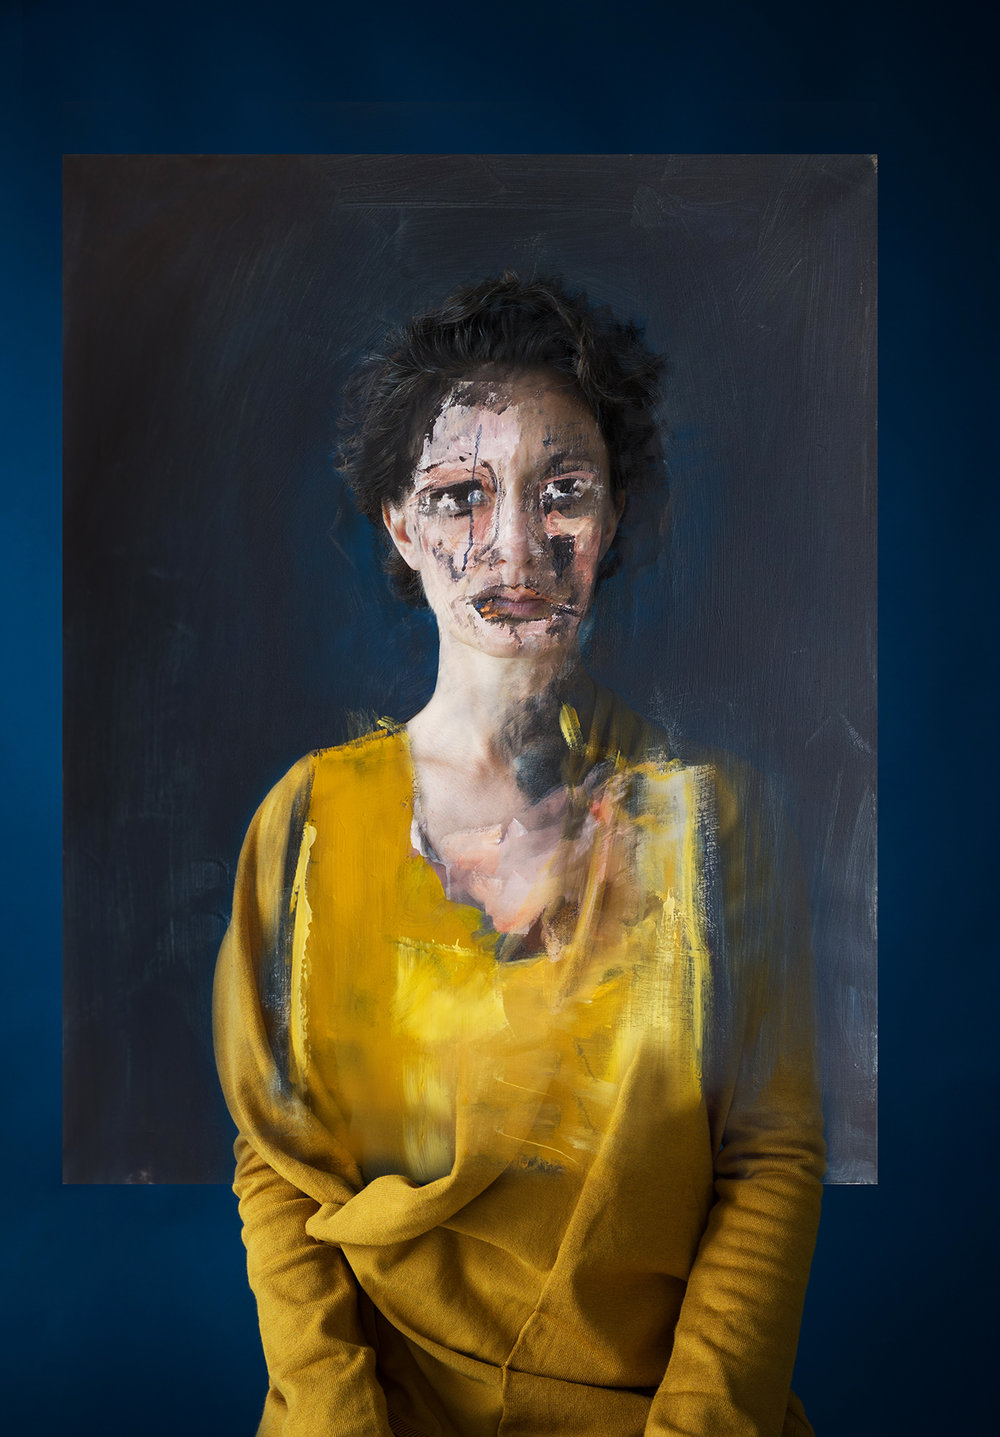 Portrait jaune_9905-test 5-web.jpg